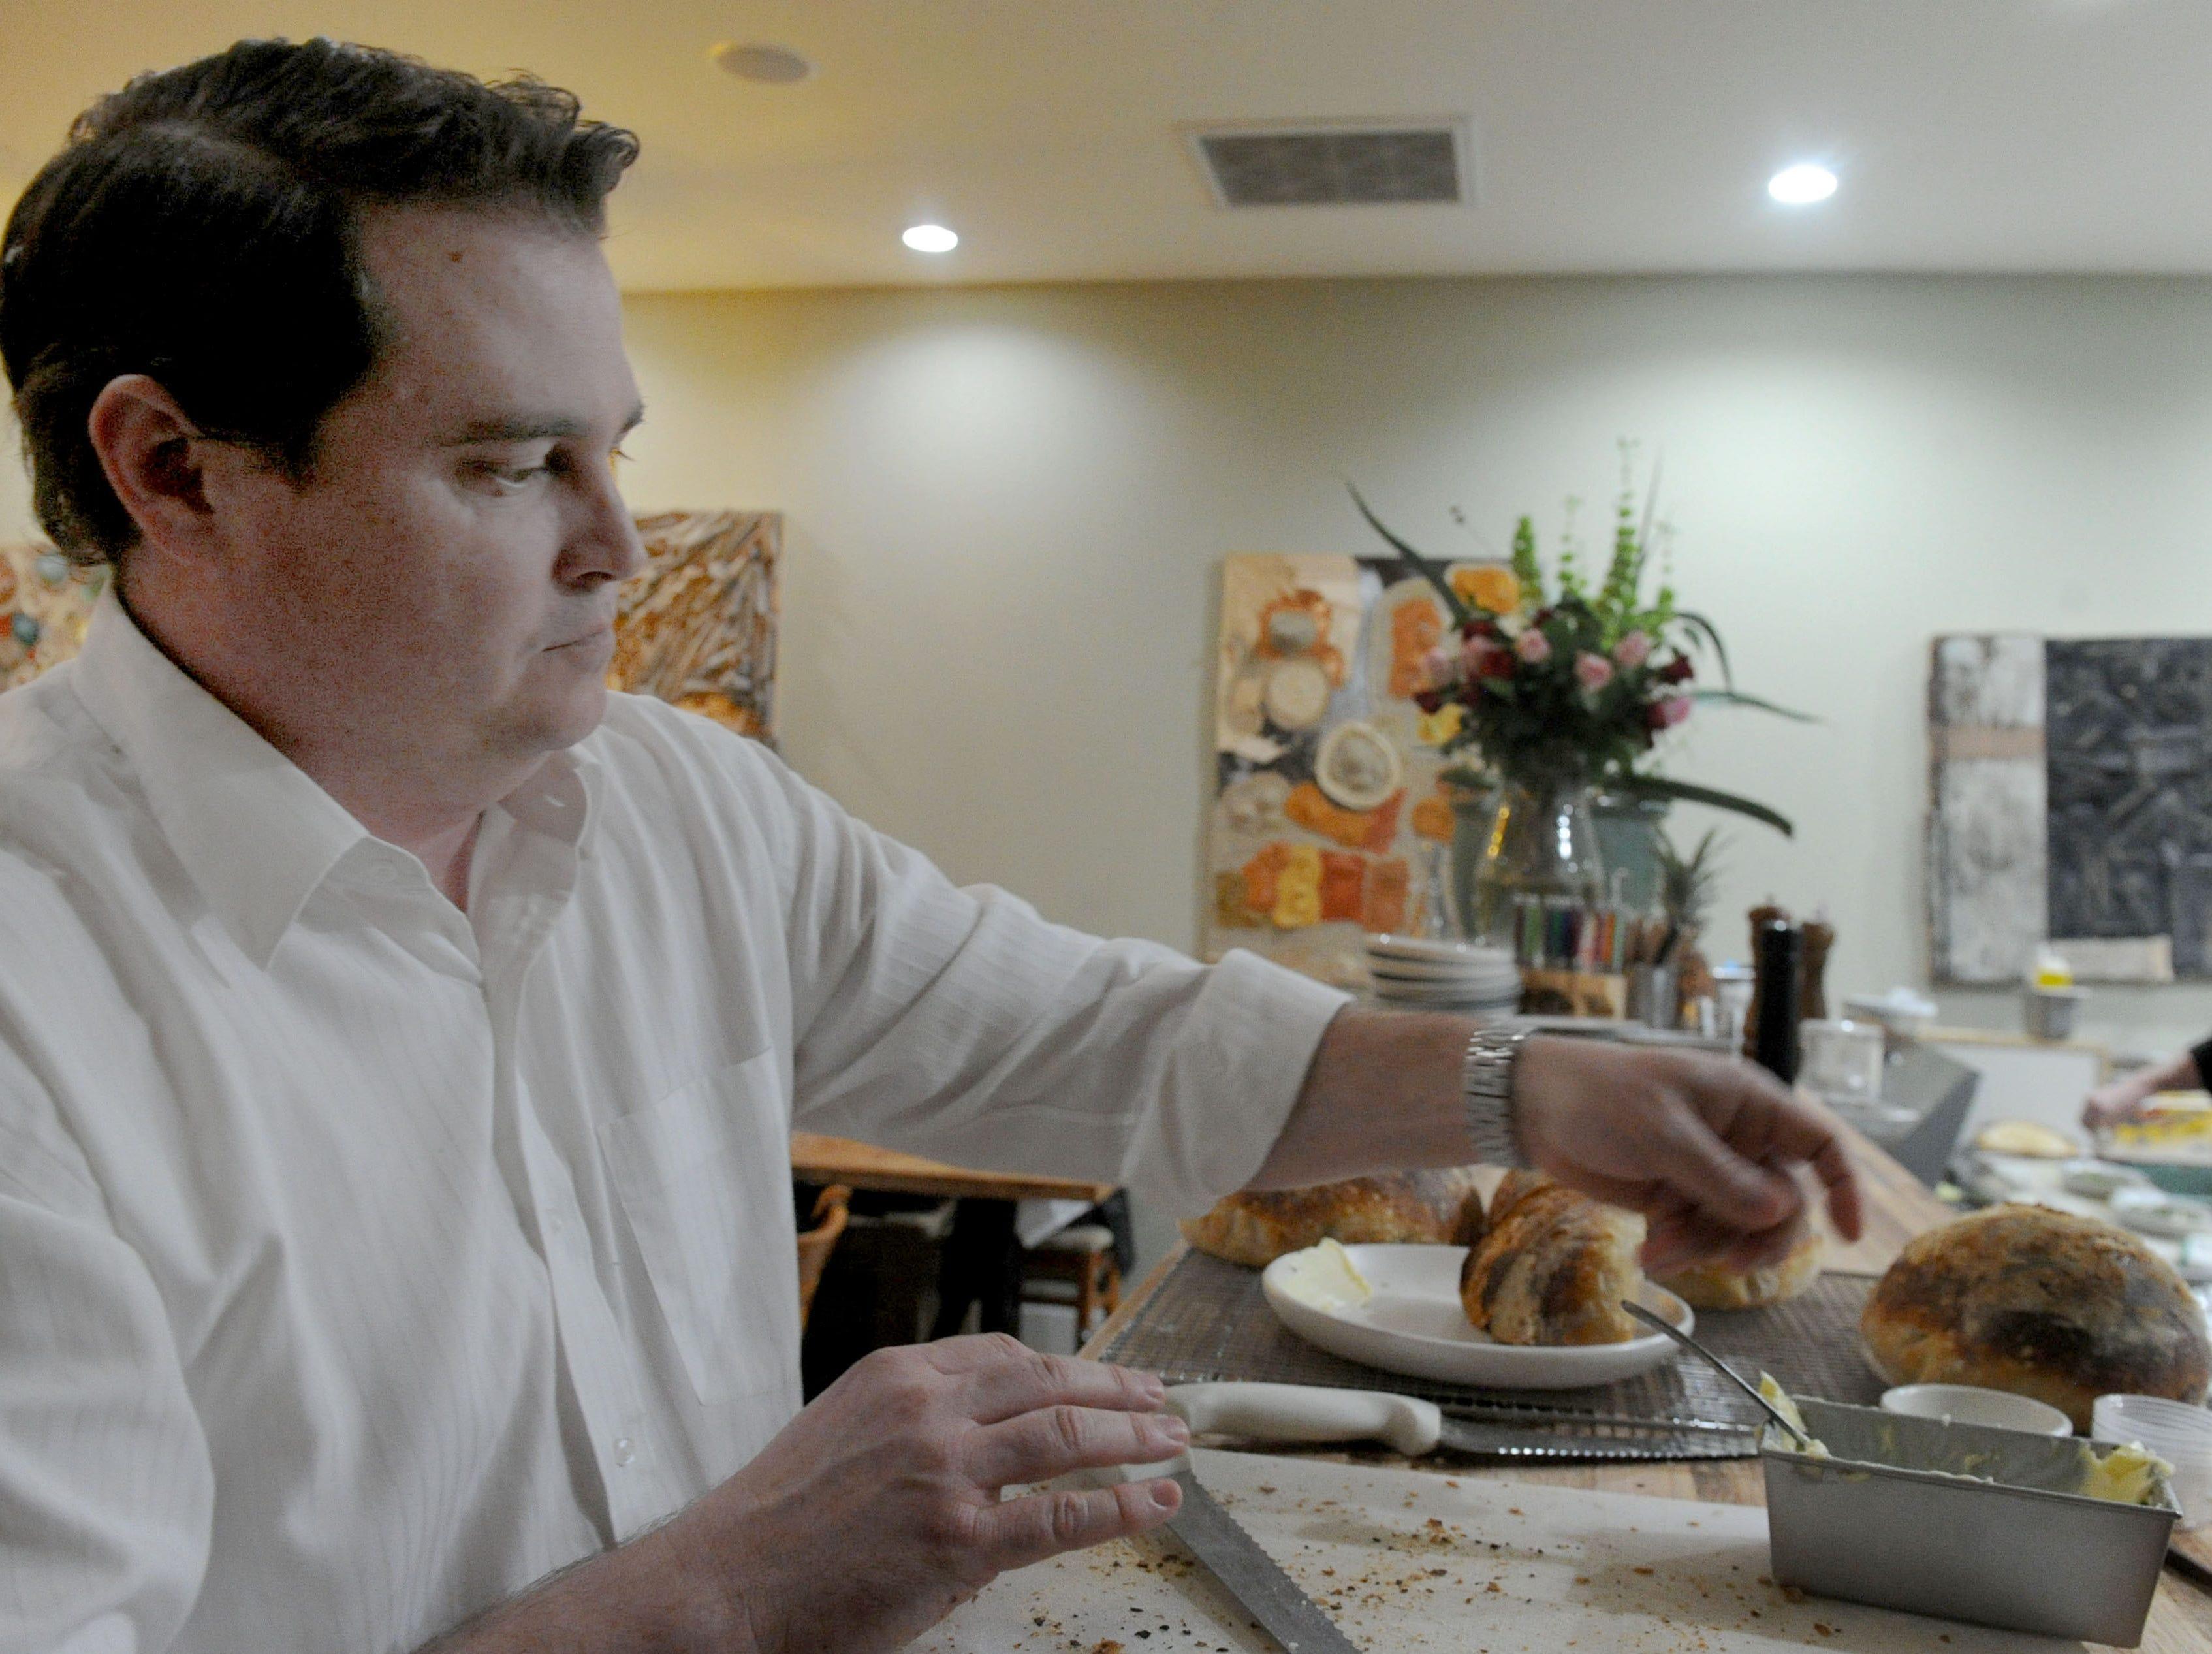 Graham Harris, owner of Decker Kitchen in Westlake Village, cuts homemade bread for customers.